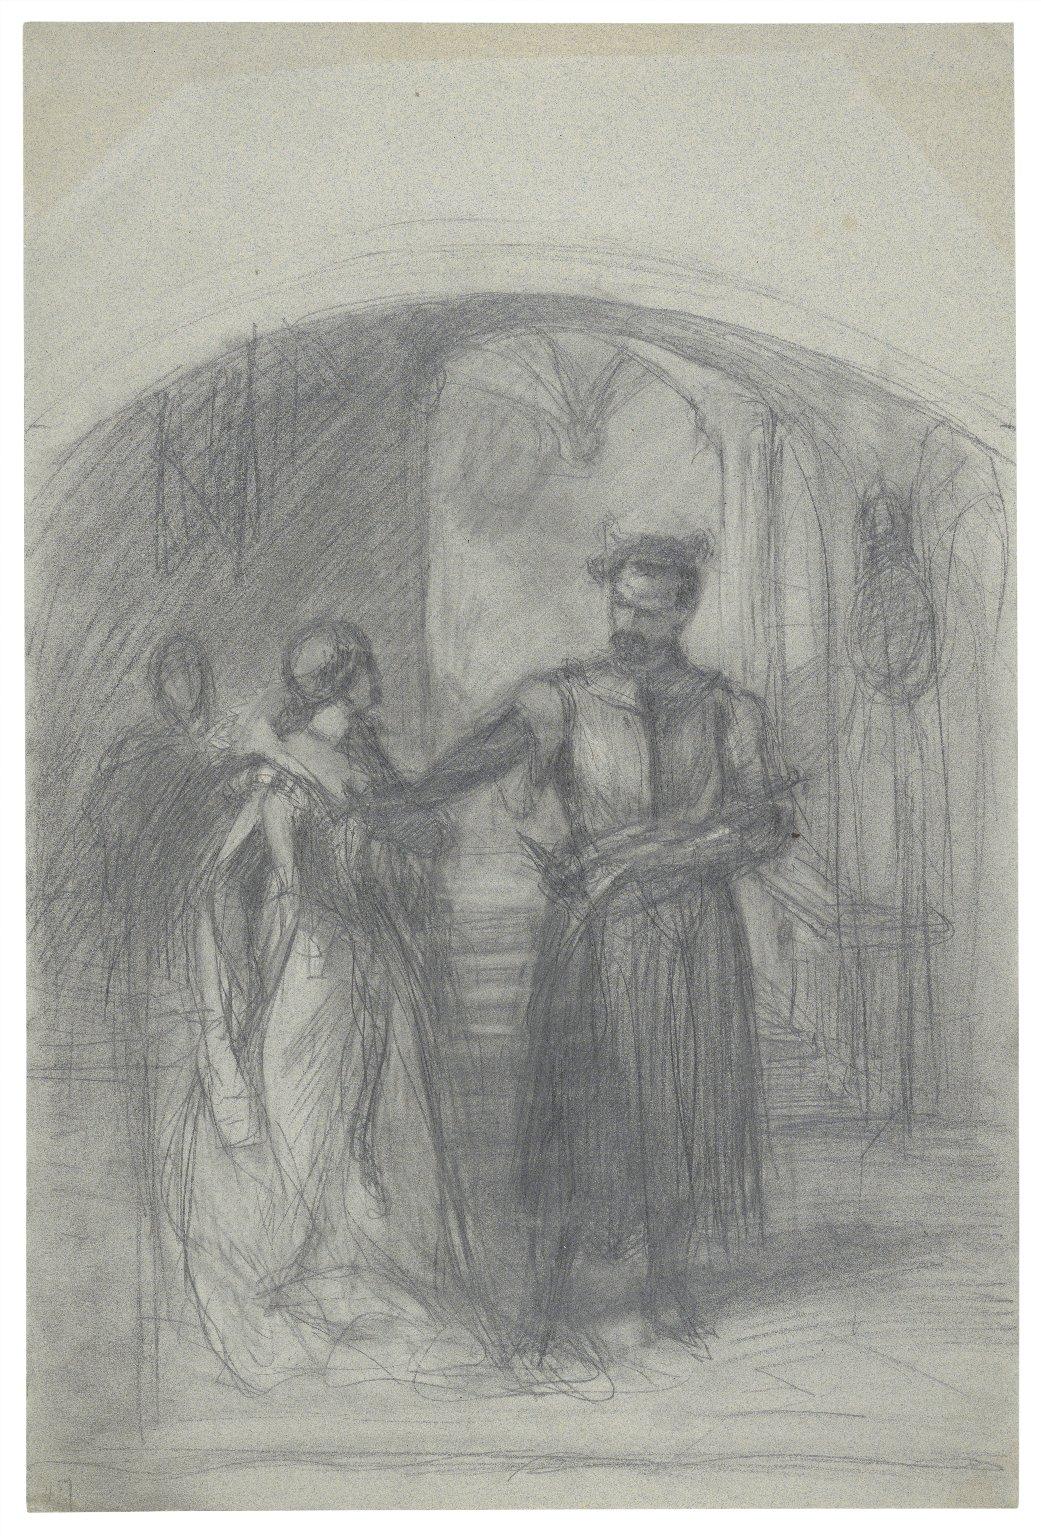 Othello & Desdemona [graphic] / [Felix Darley].